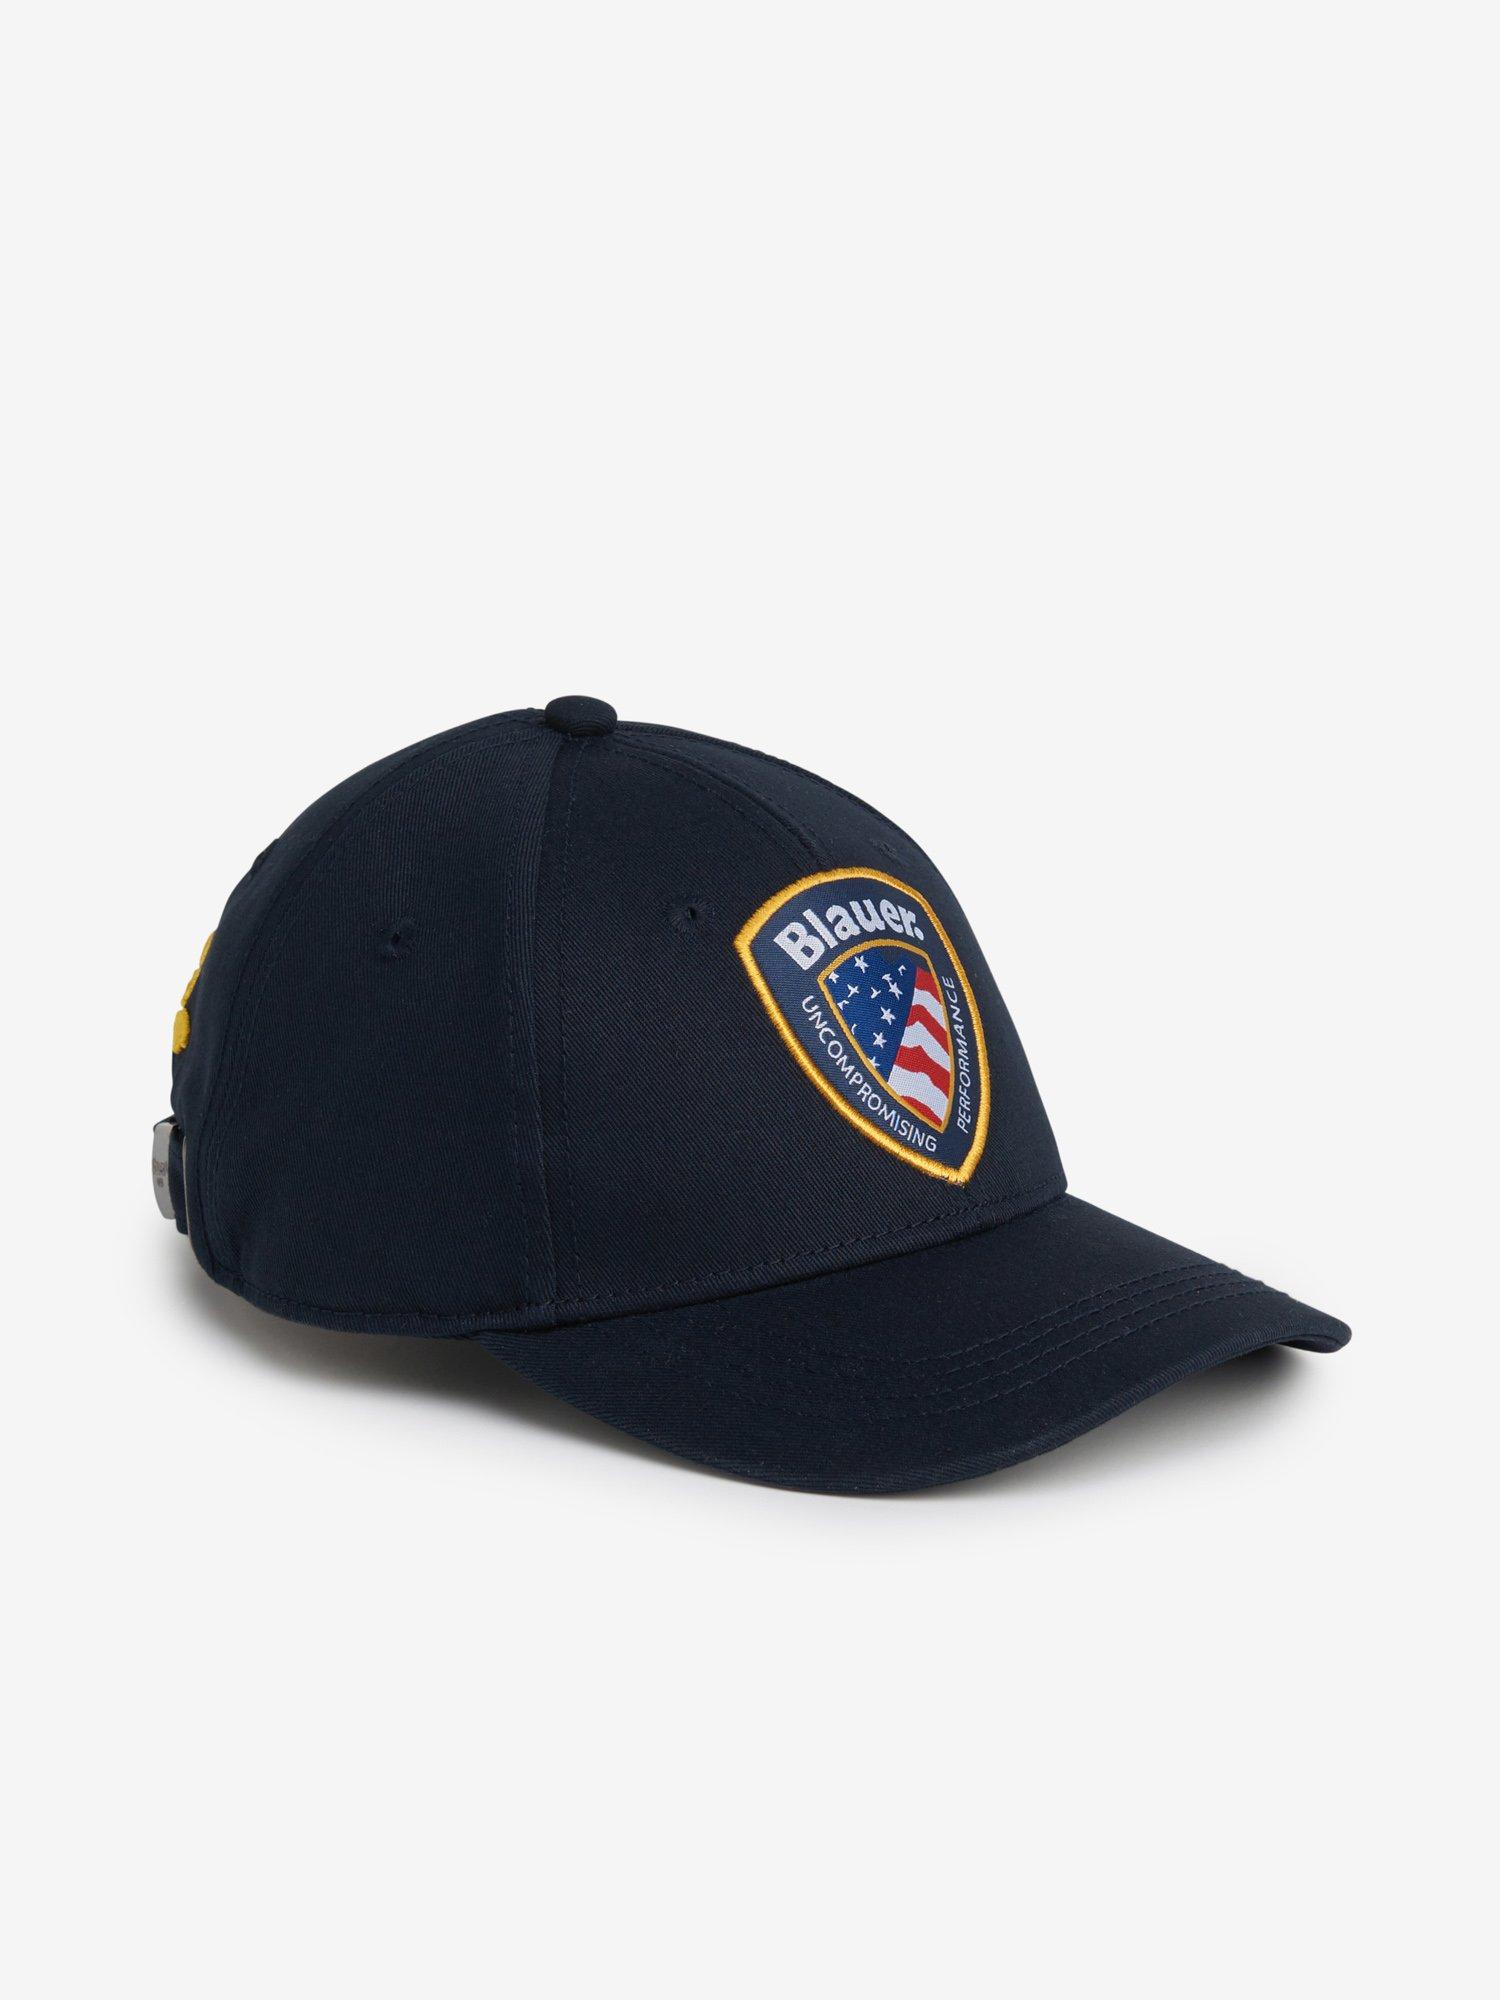 JUNIOR BASEBALL CAP WITH BLAUER PATCH - Blauer